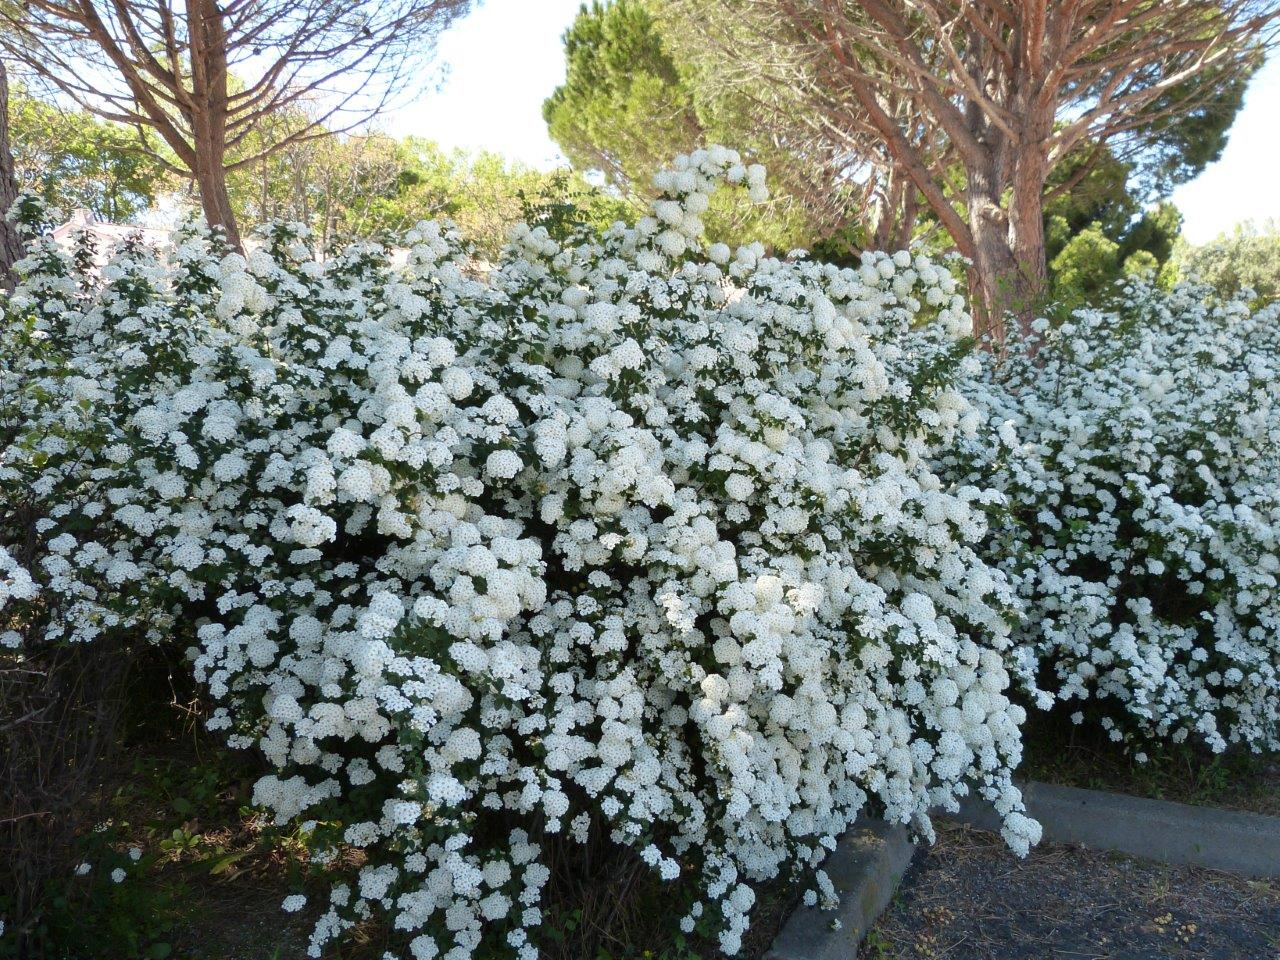 lac fleurs printemps blanches - photo #7